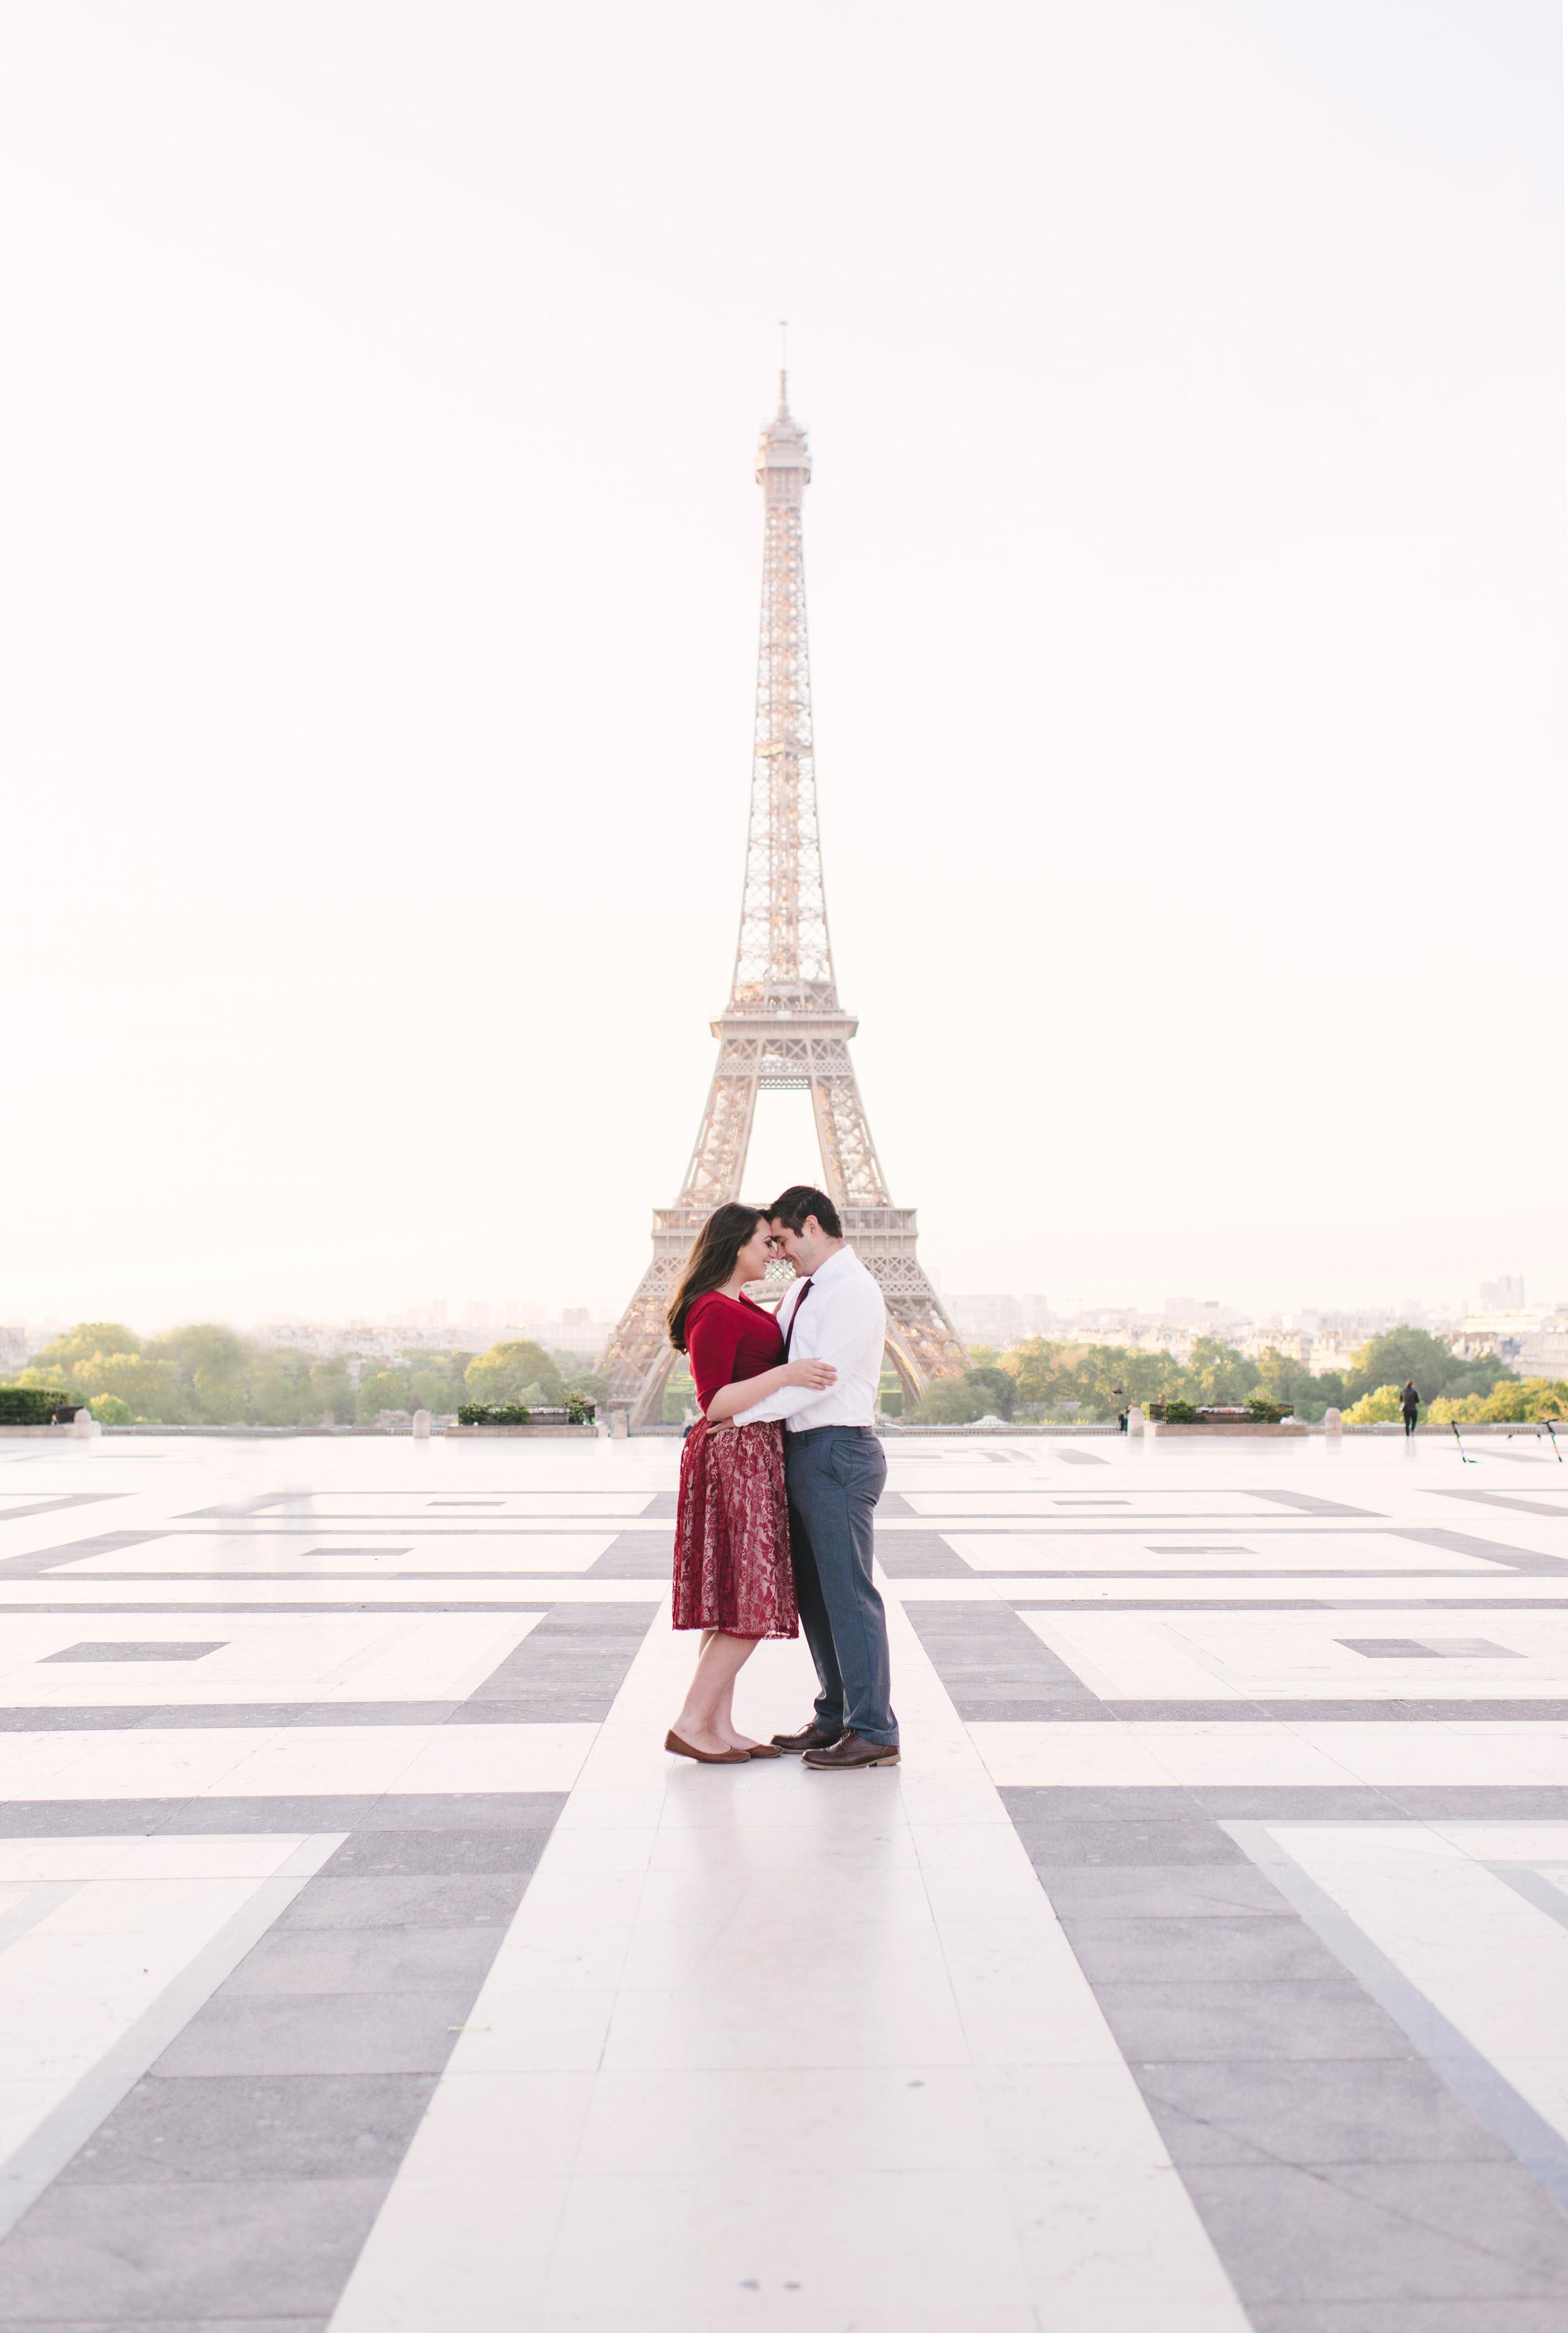 Couple-photoshoot-Anniversary-Paris-Eiffel-Tower-Trocadero009.jpg